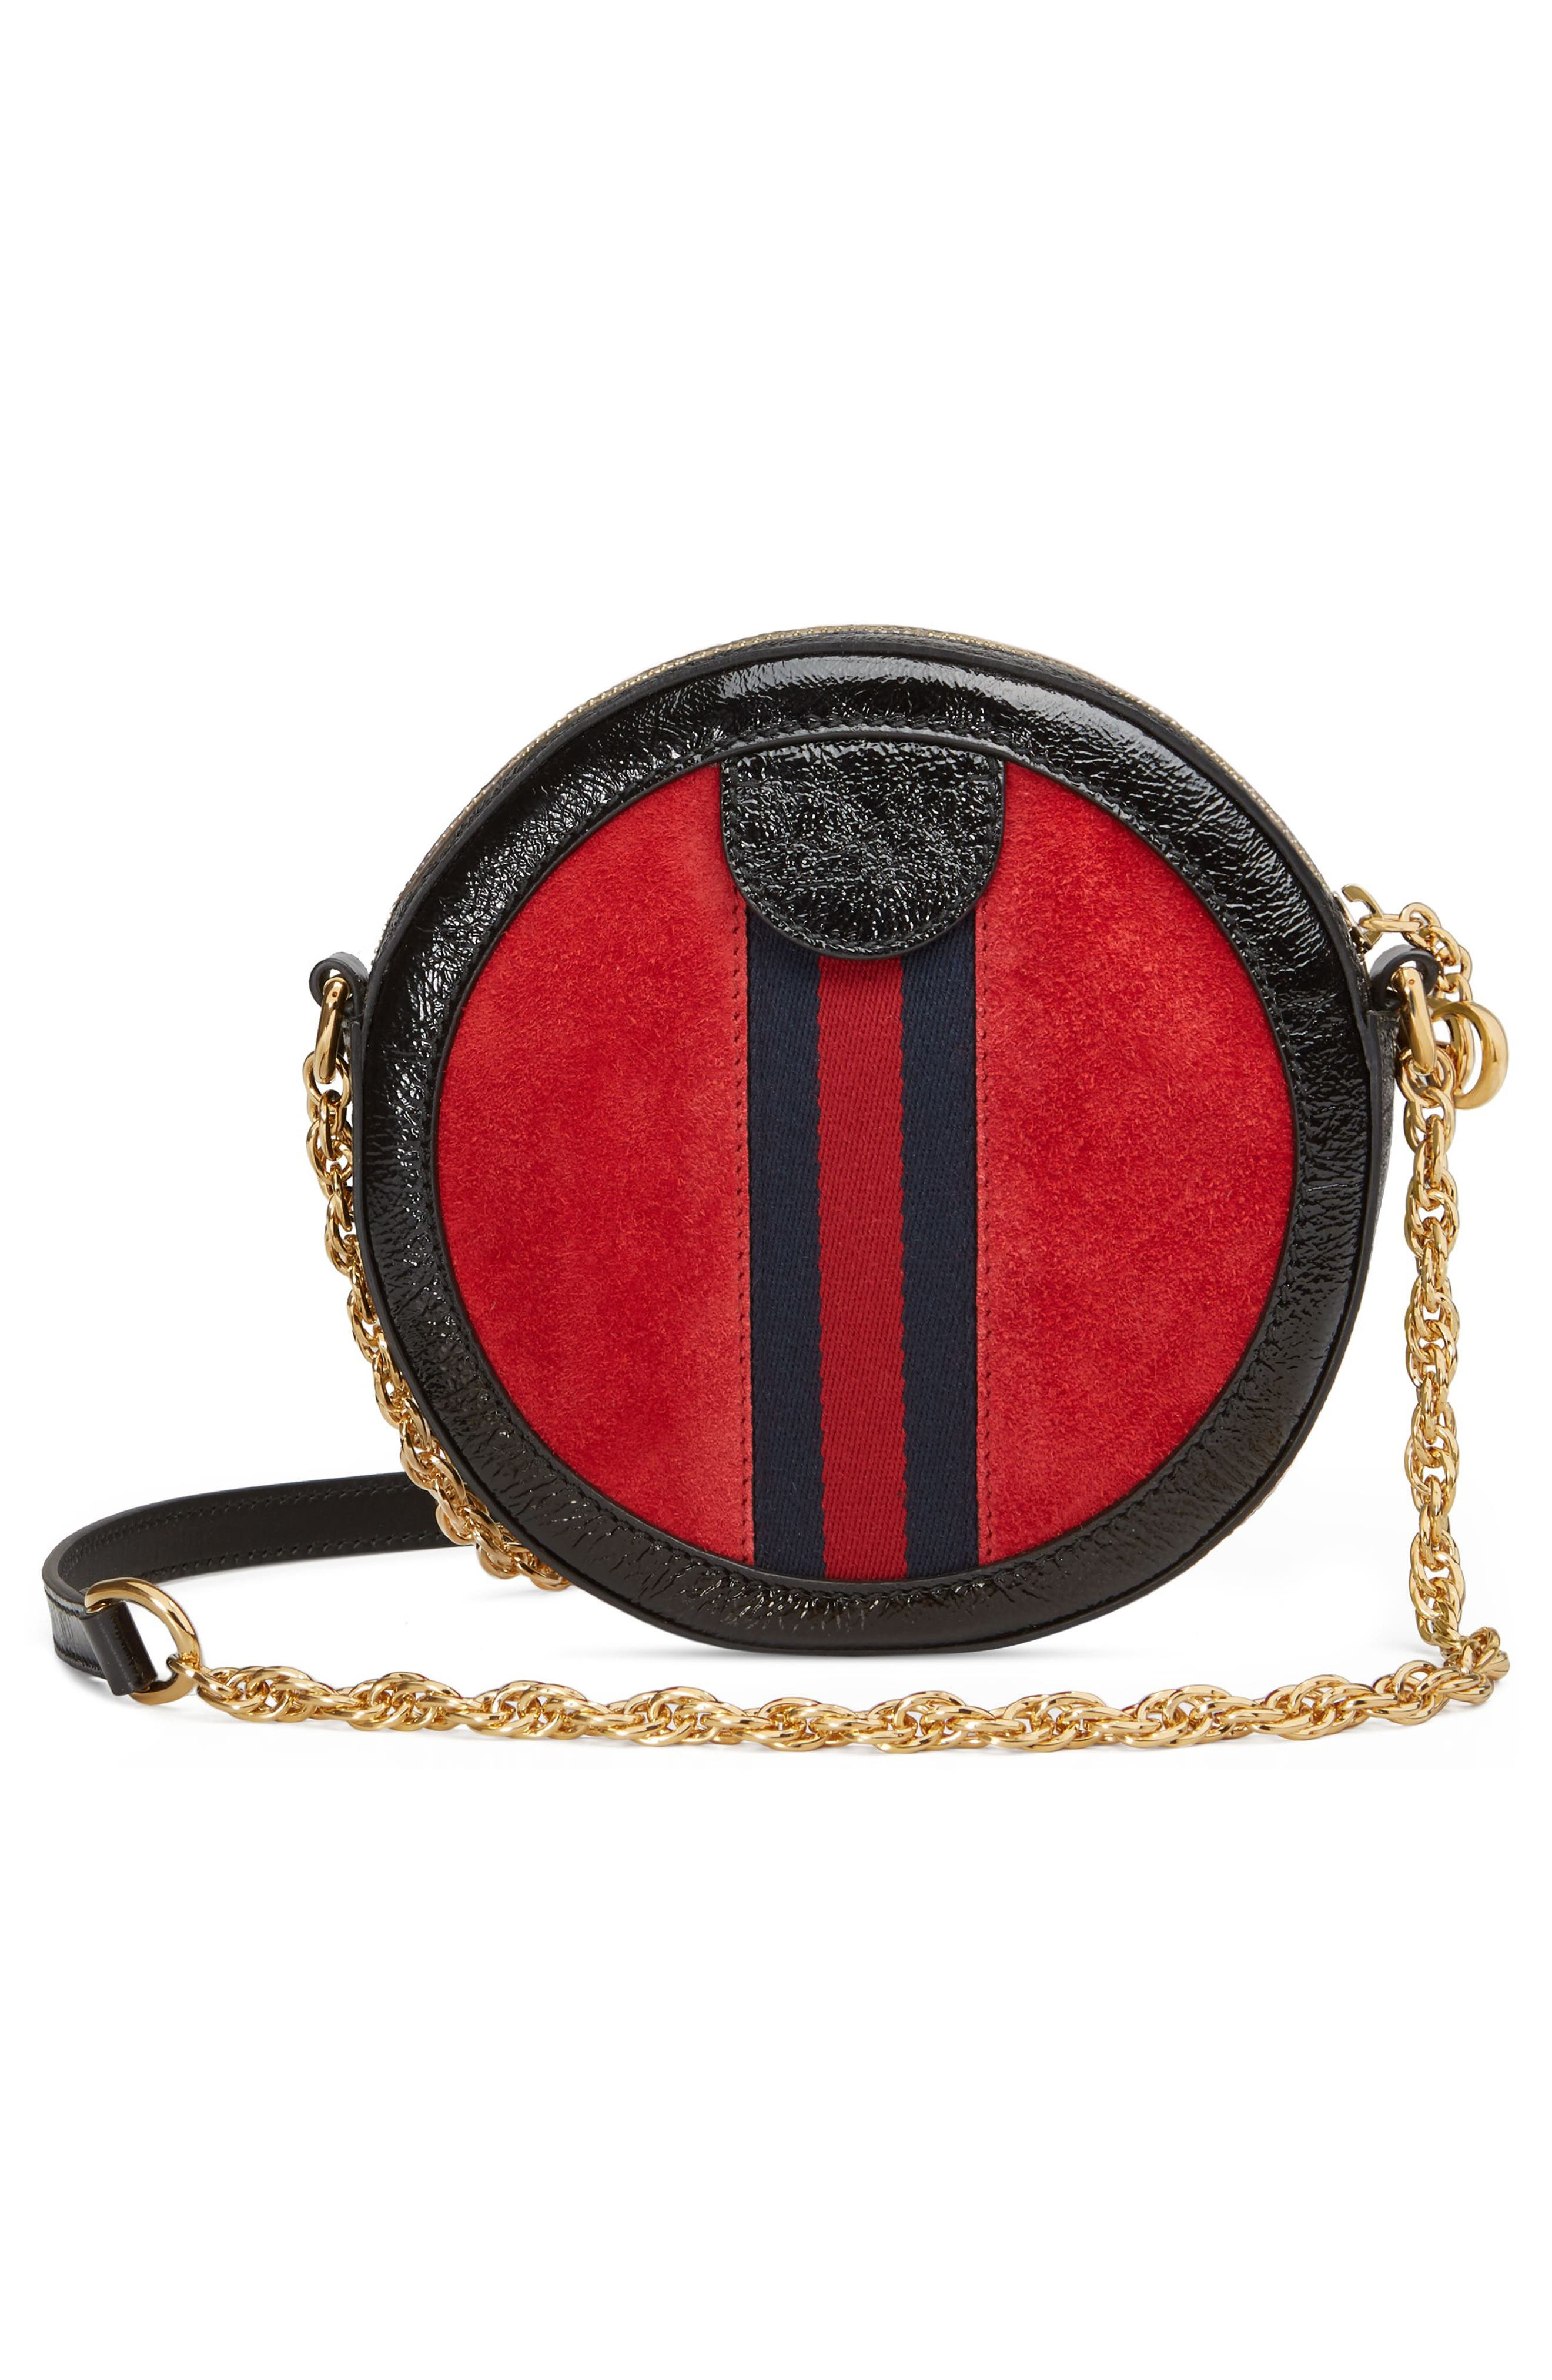 Mini Ophidia Round Shoulder Bag,                             Alternate thumbnail 2, color,                             HIBISCUS RED/ NERO/ BLUE